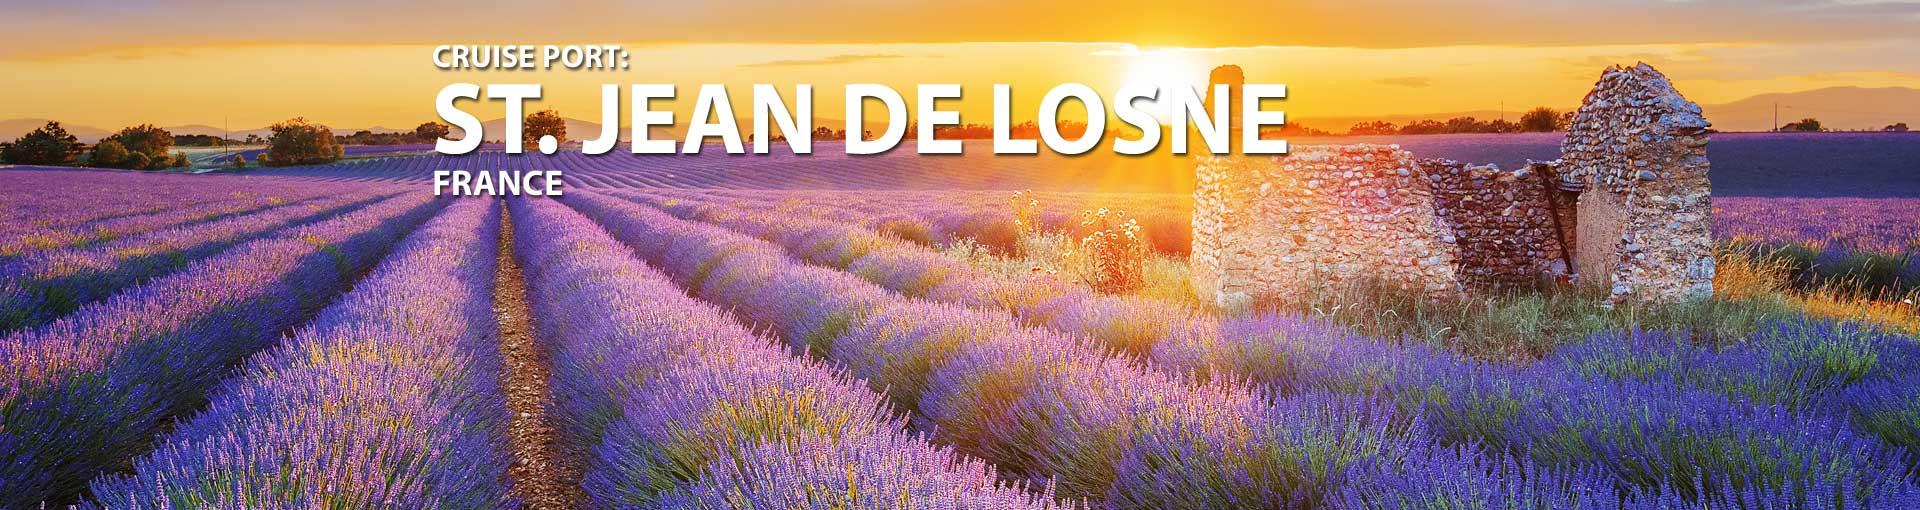 St. Jean De Losne, France Cruise Port